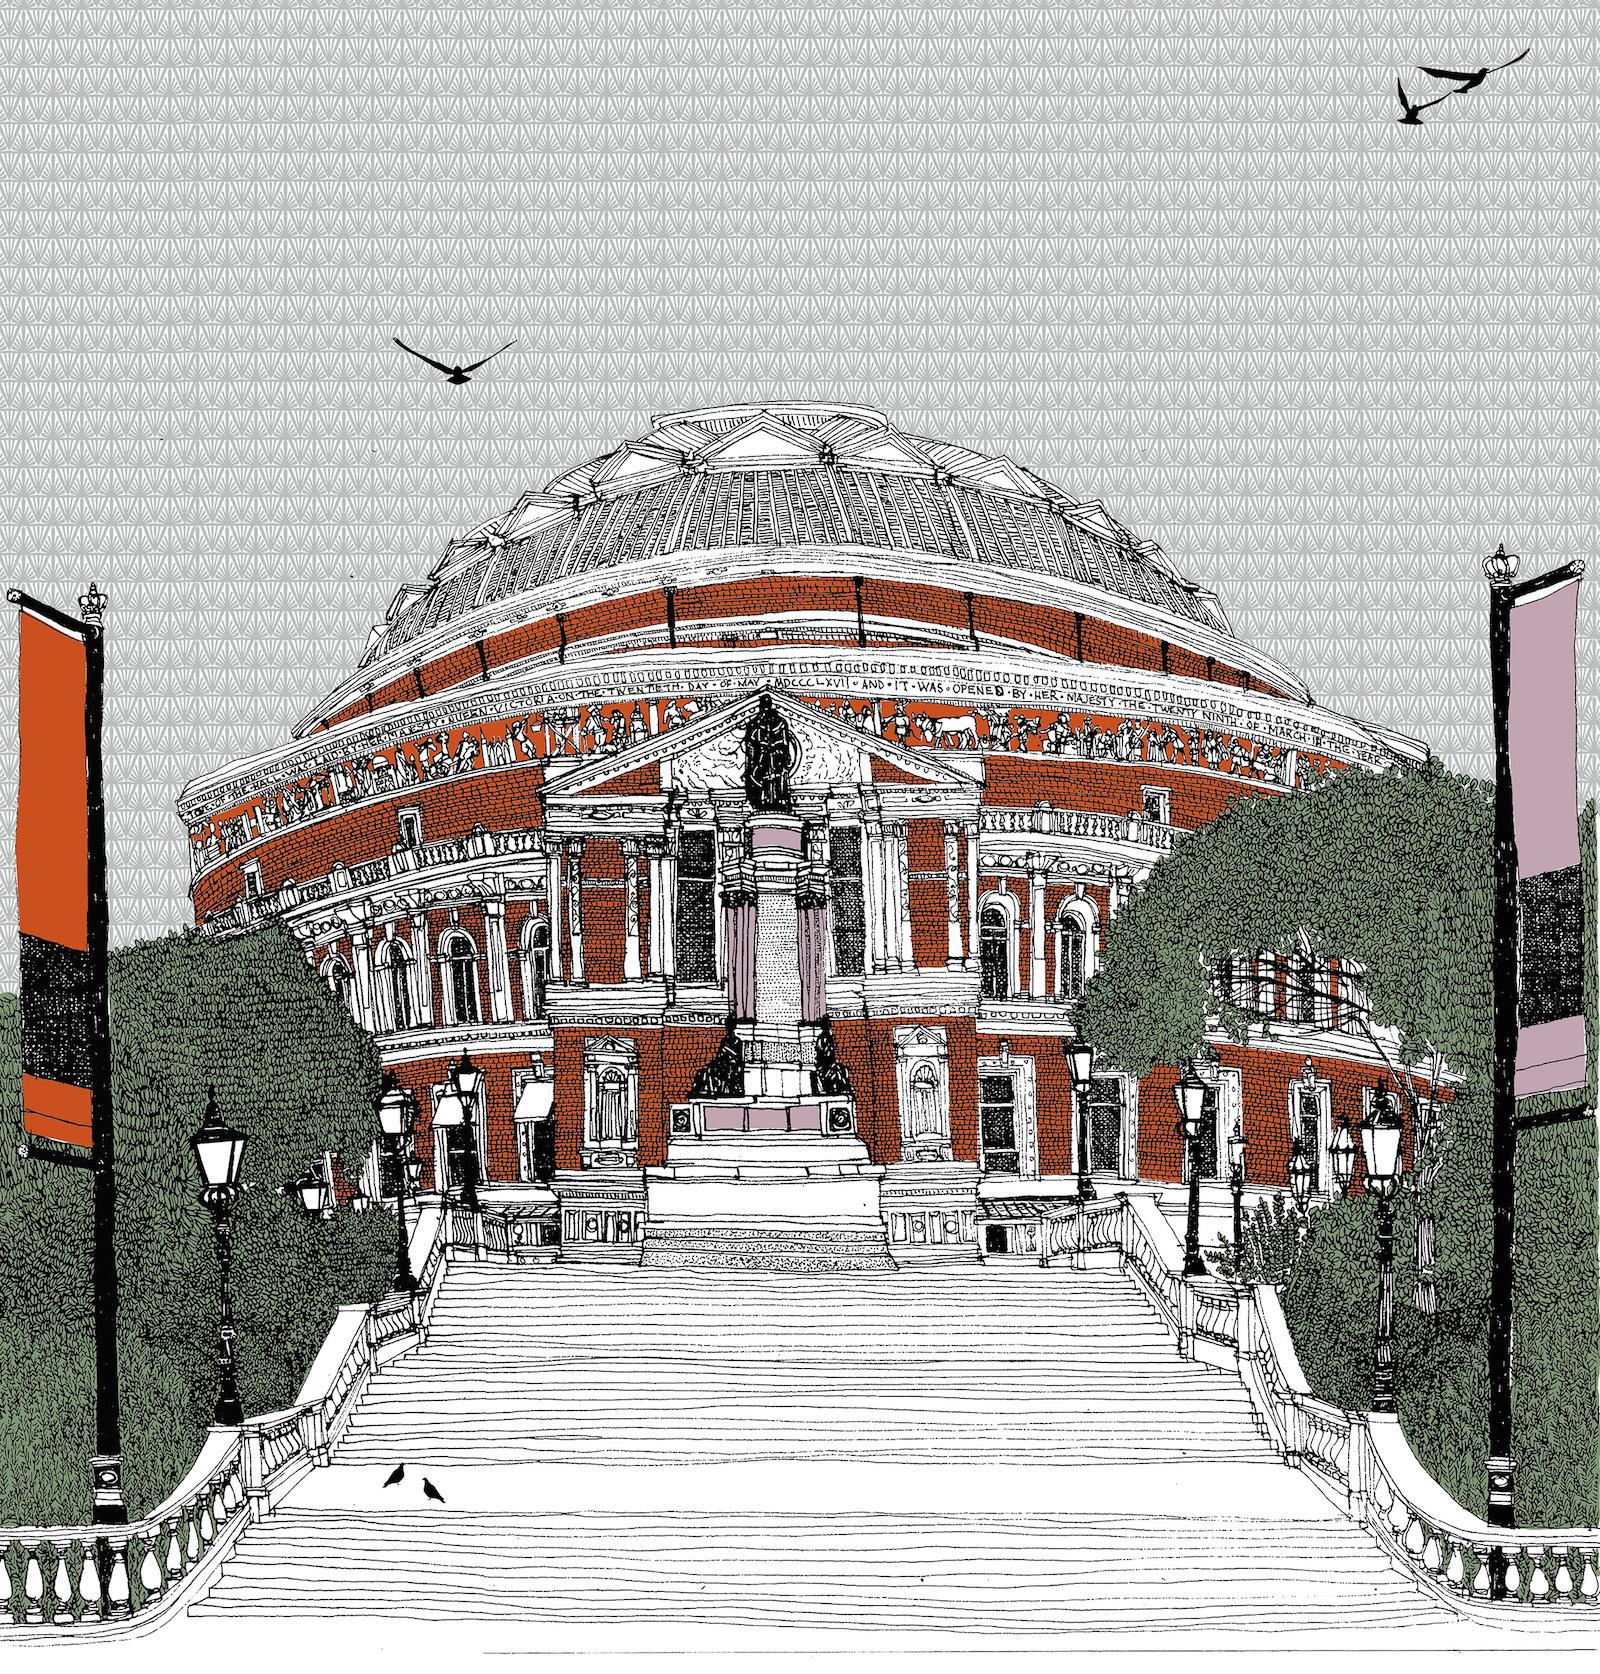 Stairway to Royal Albert Hall